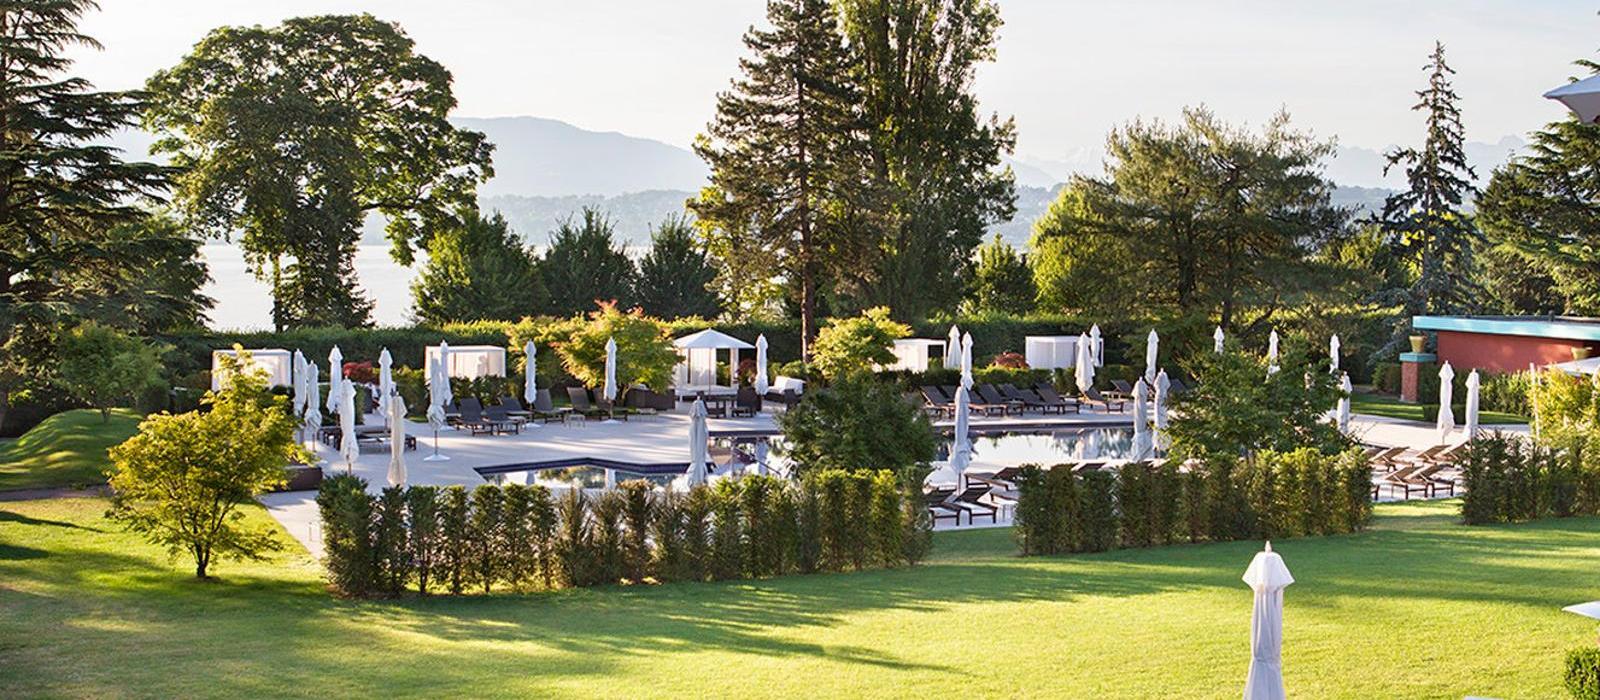 日内瓦瑞瑟夫水疗酒店(La Reserve Geneve Hotel, Spa & Villa) 图片  www.lhw.cn